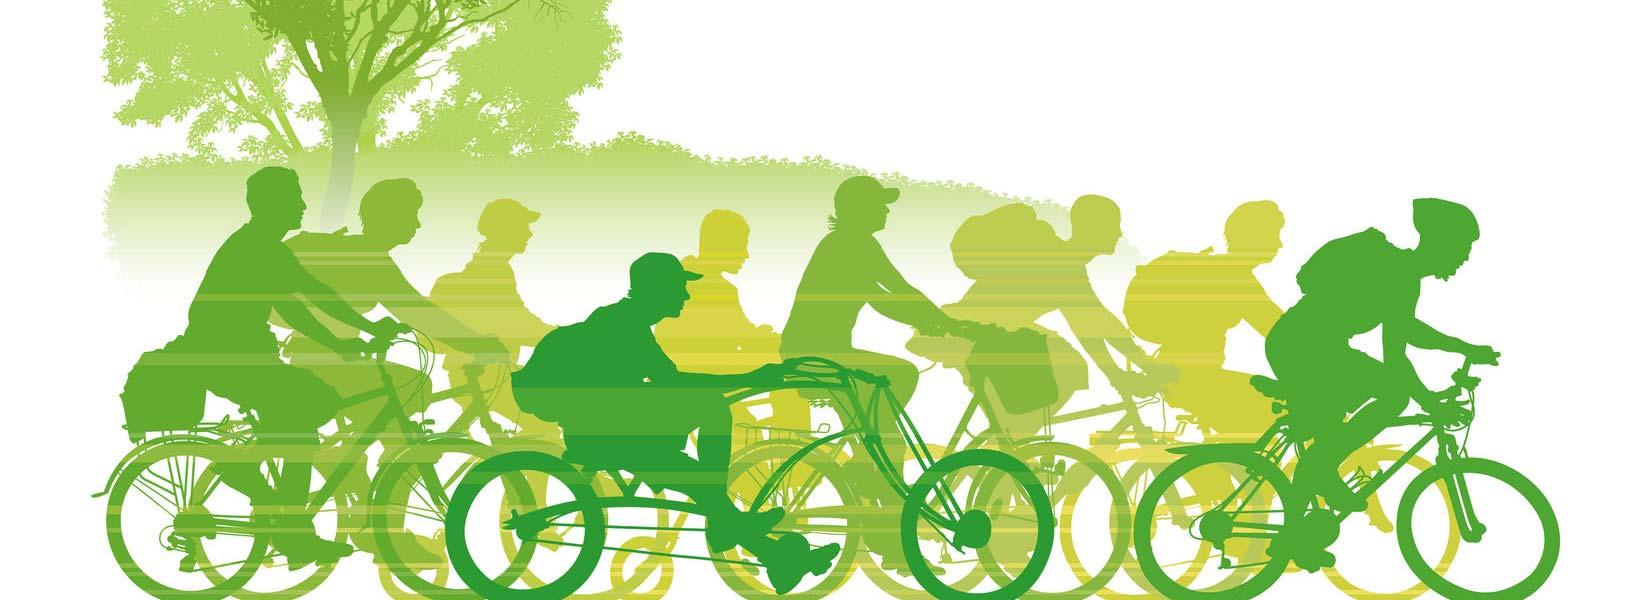 Componentes de Bicicleta Uso Adulto